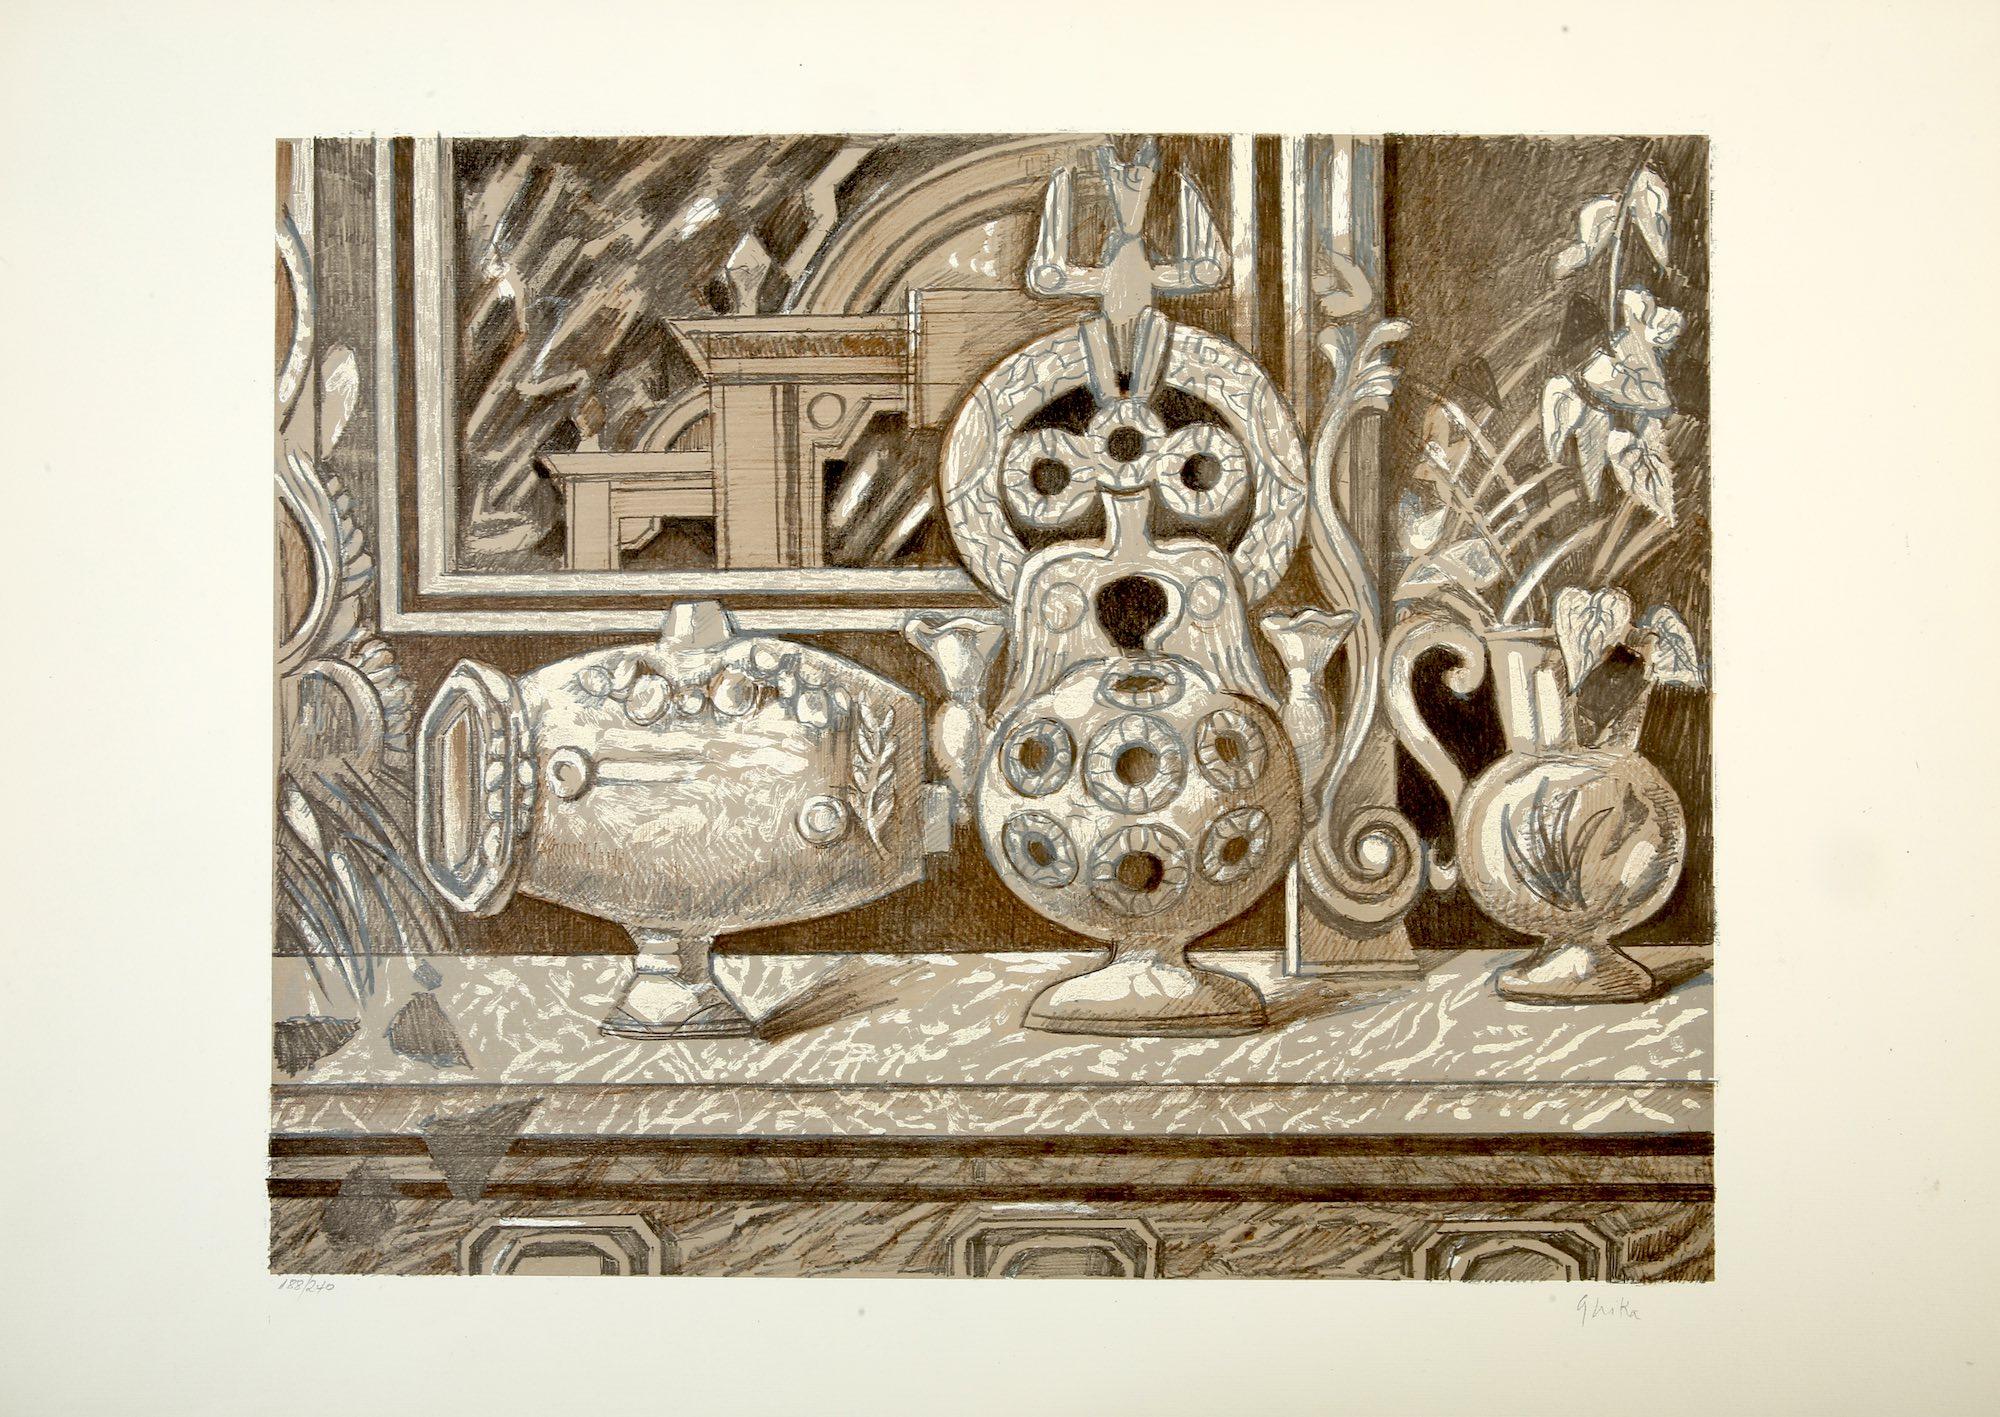 Nikos Hadjikyriakos-Ghika | Still life with Çanakkale pottery